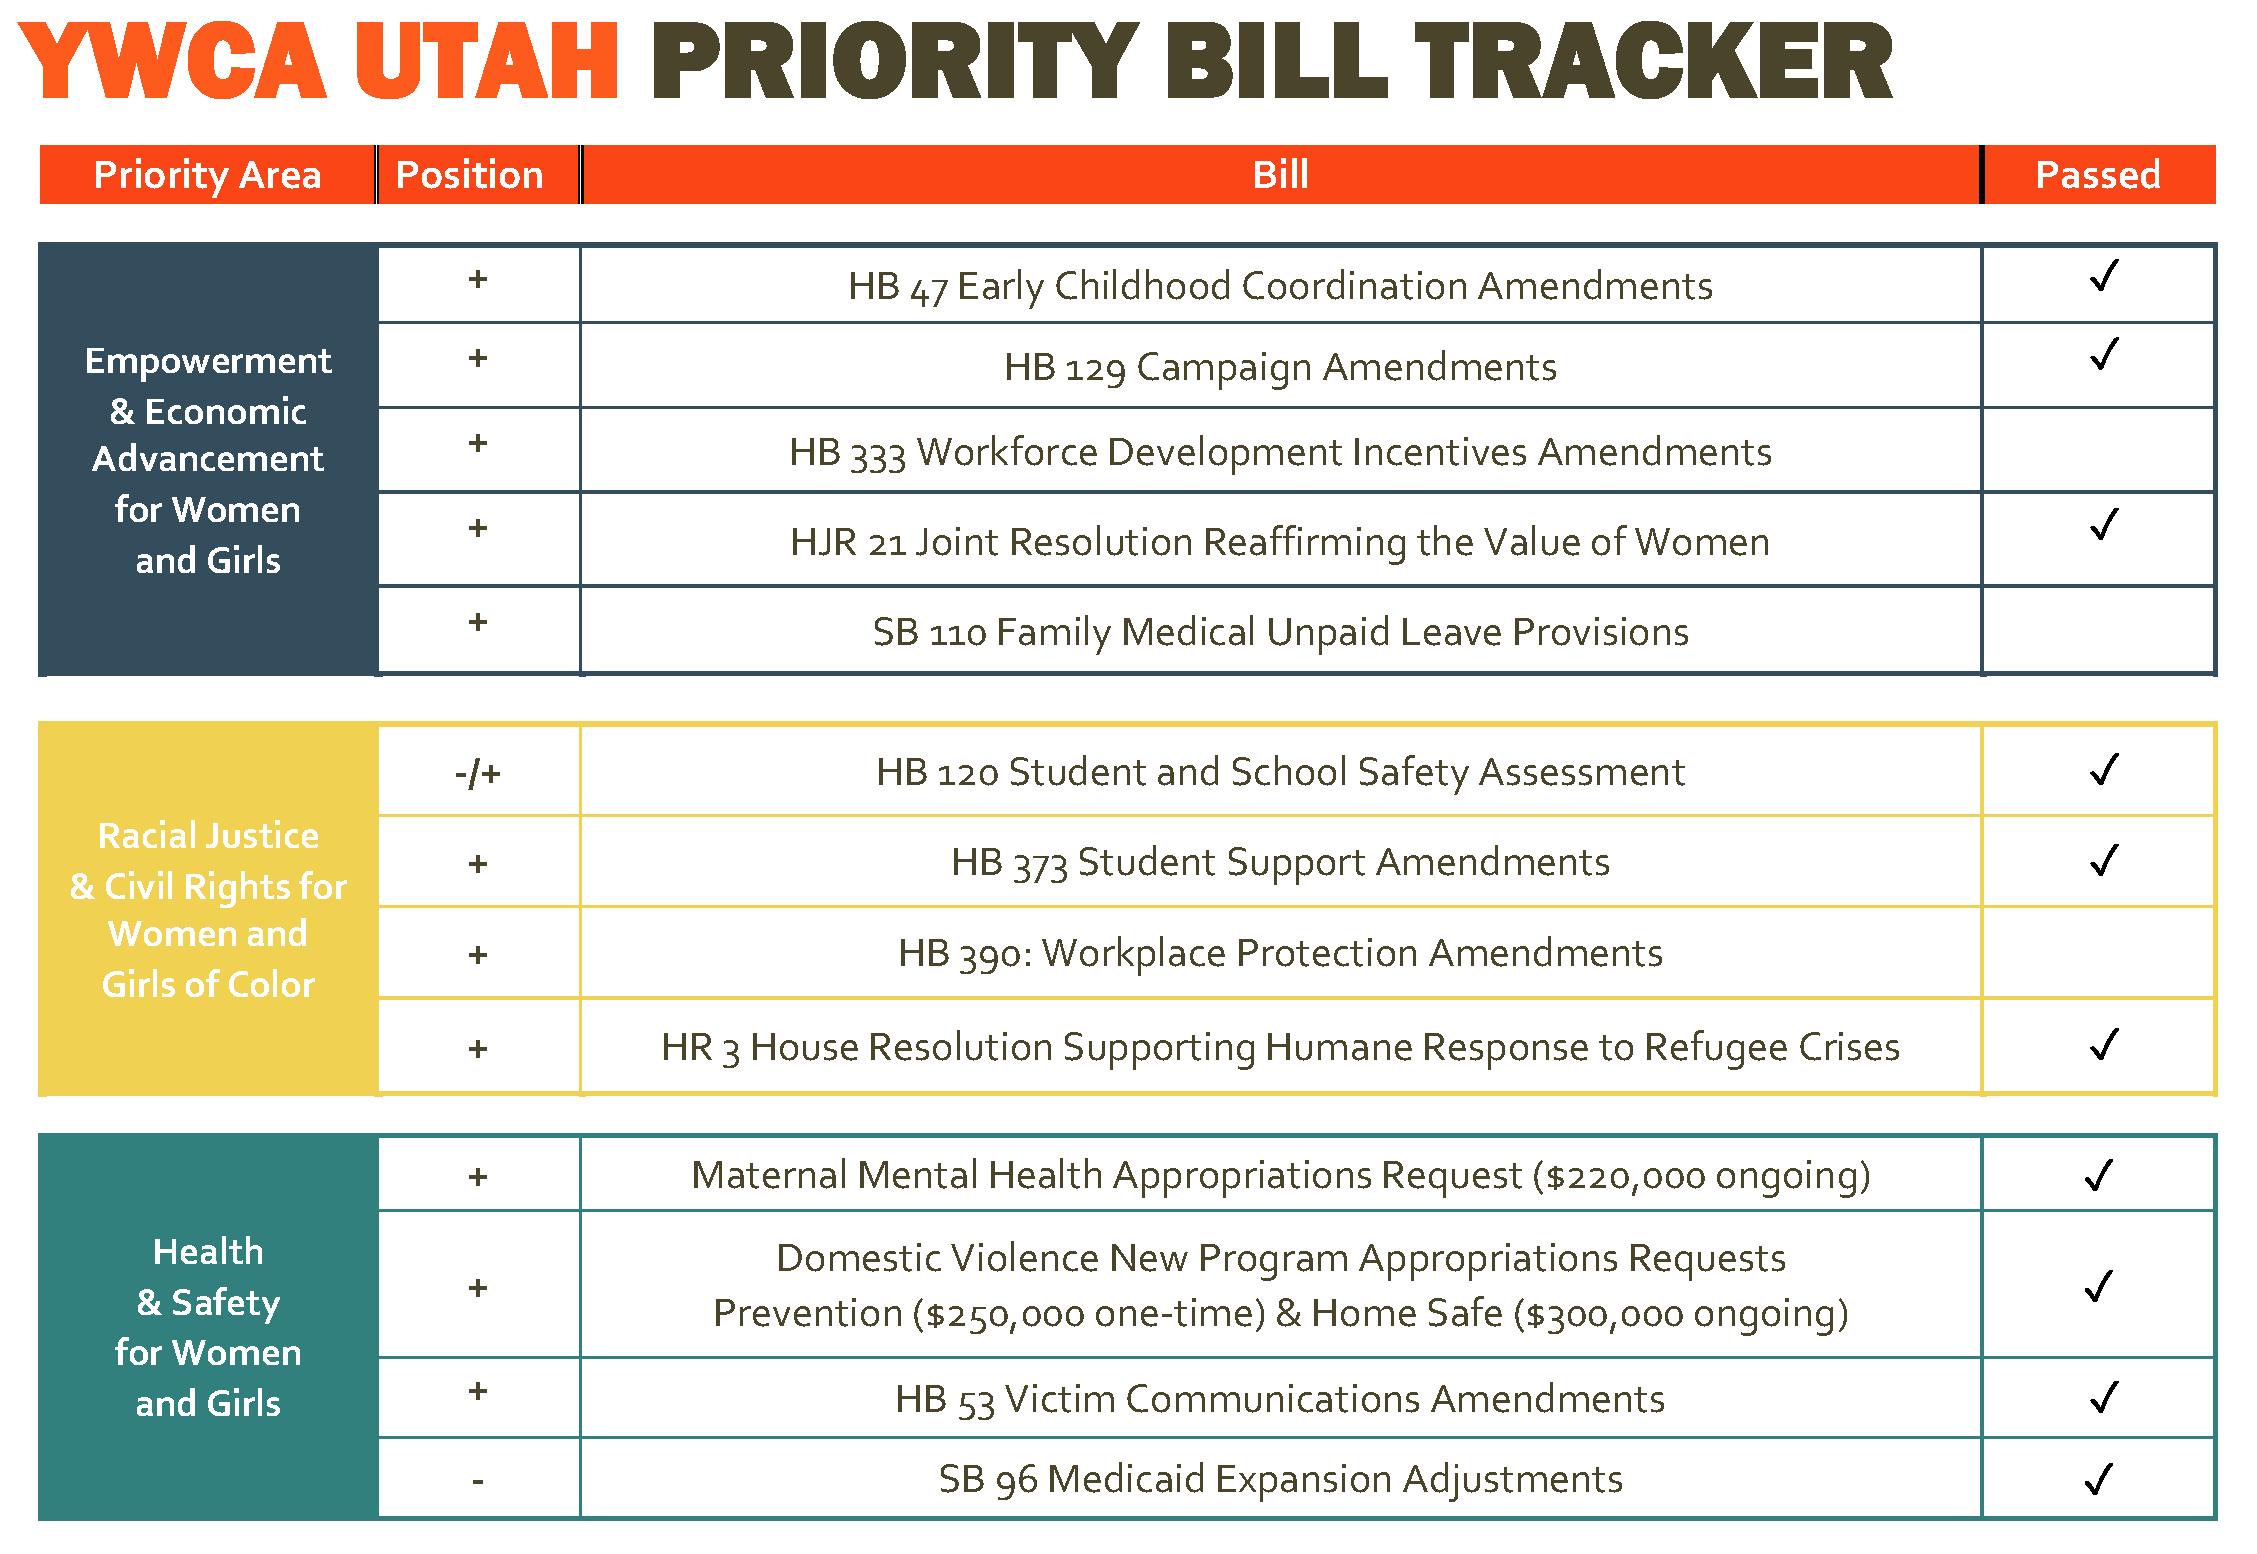 Final Bill Tracker